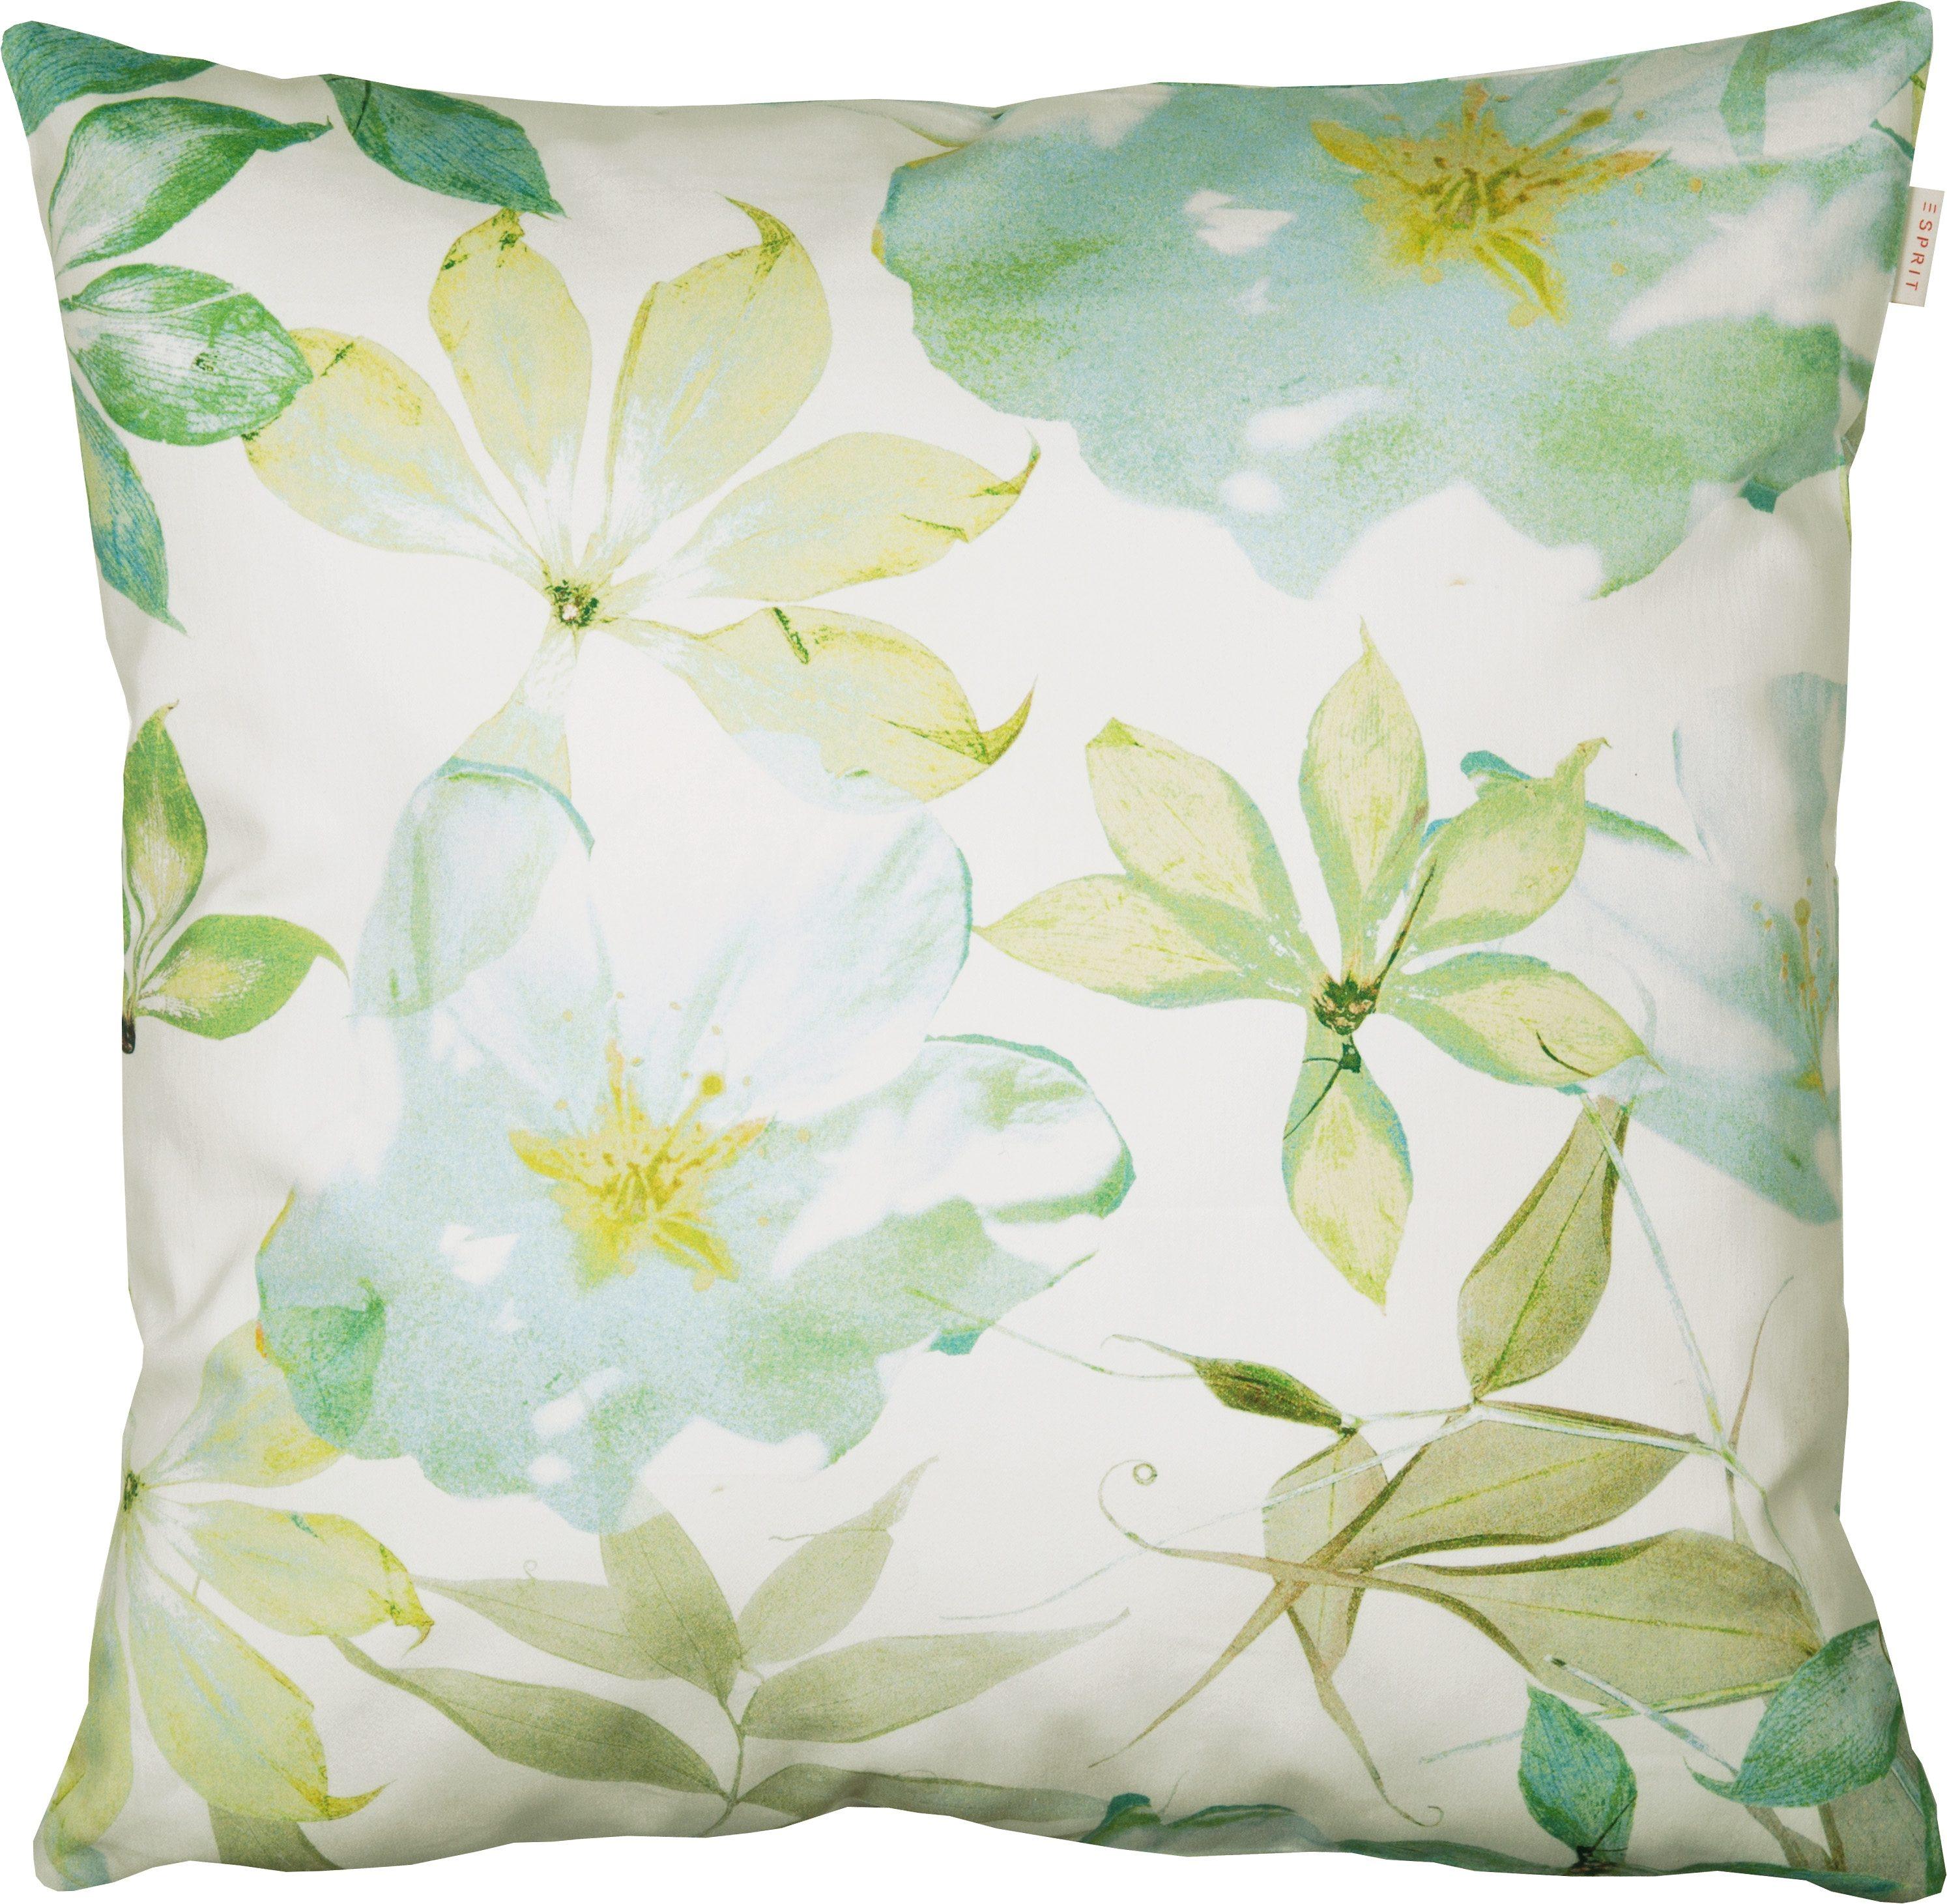 Kissenhülle, Esprit, »Lakeside Waterlilies« (1 Stück)